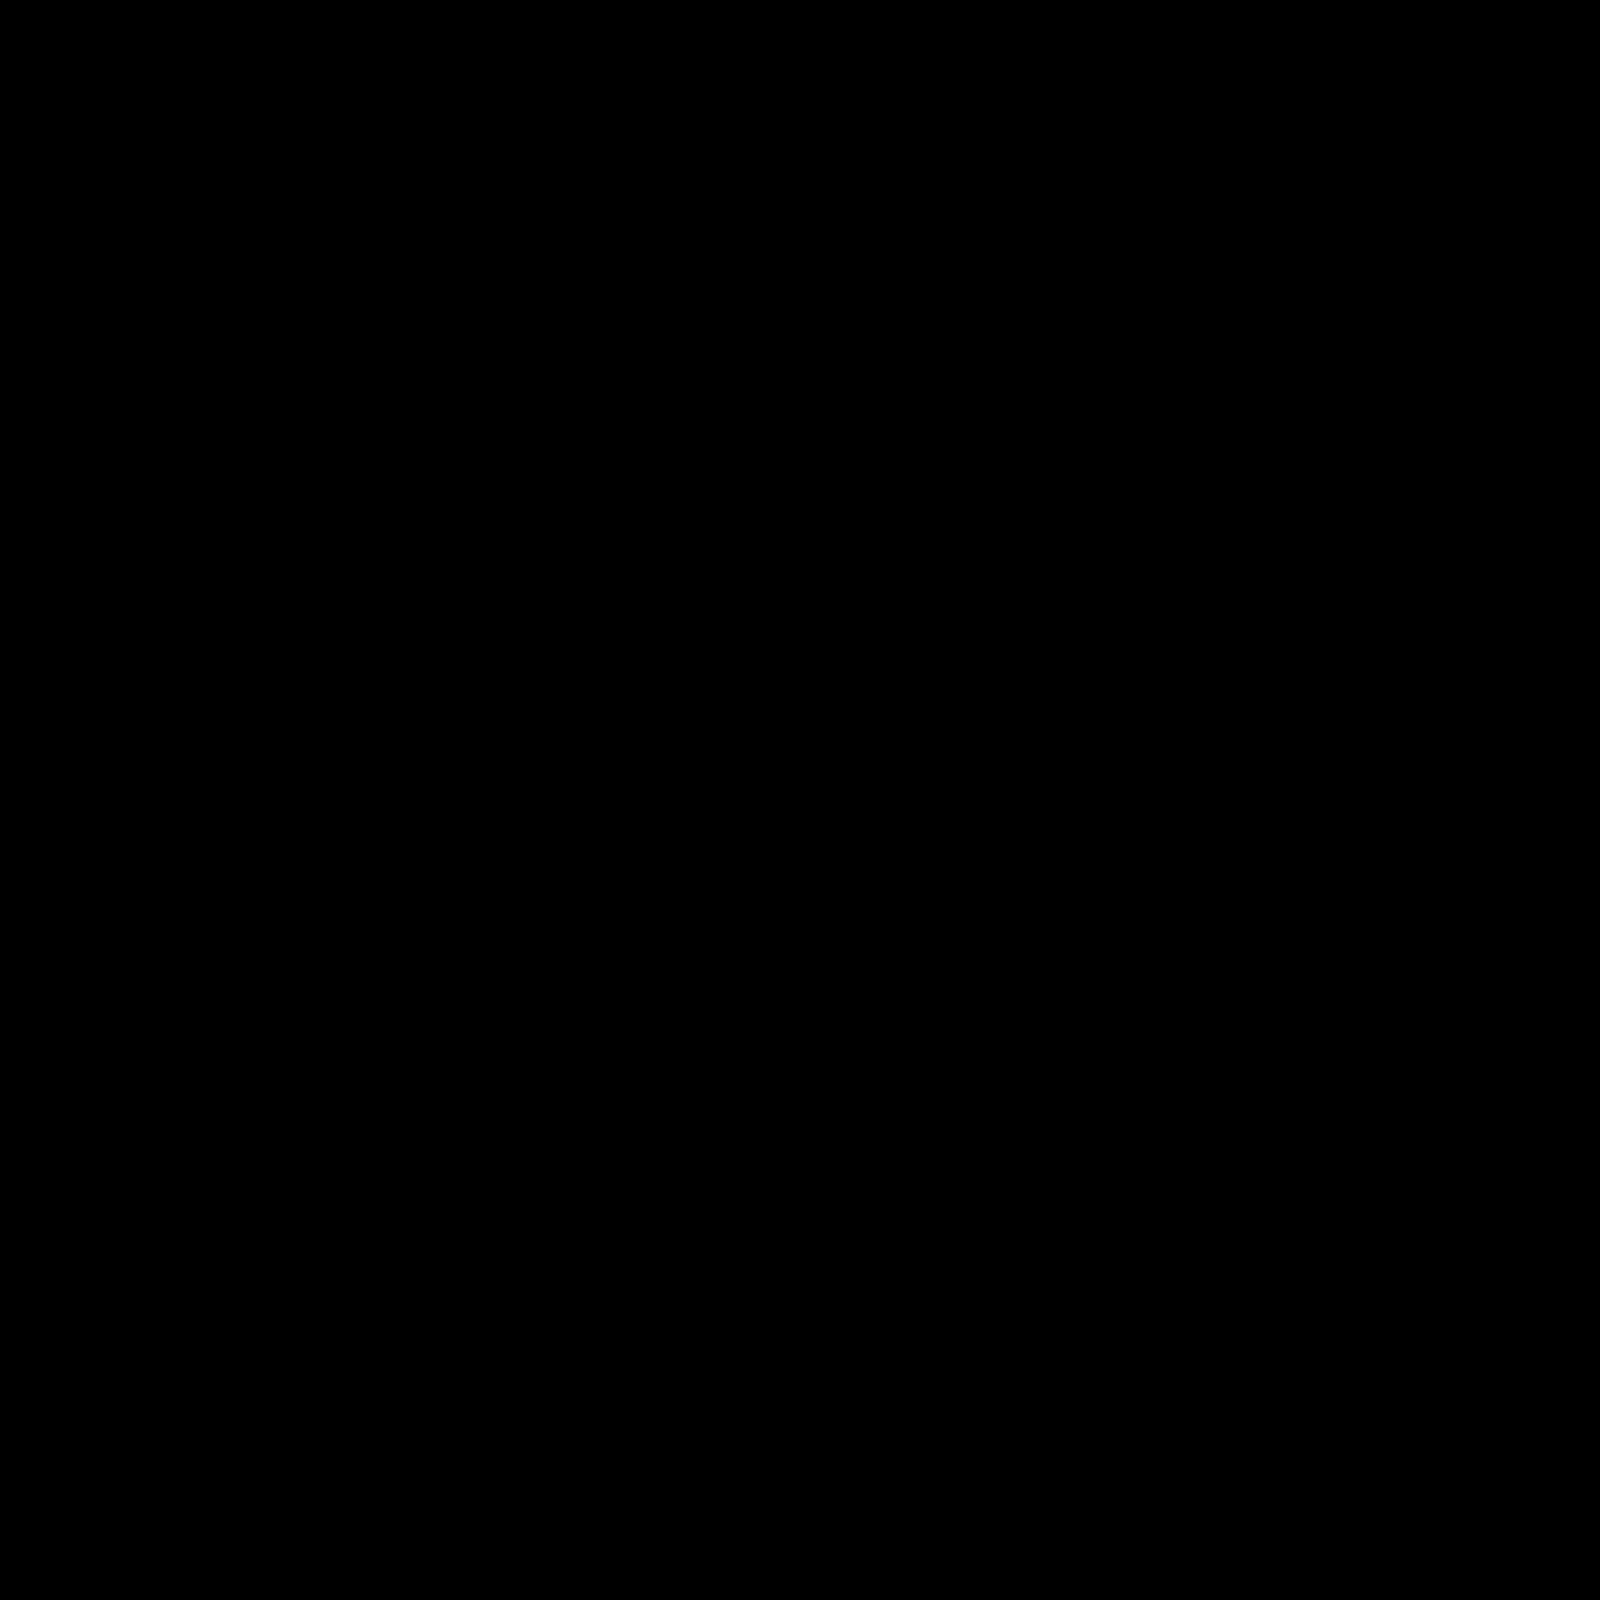 Align Text Top icon